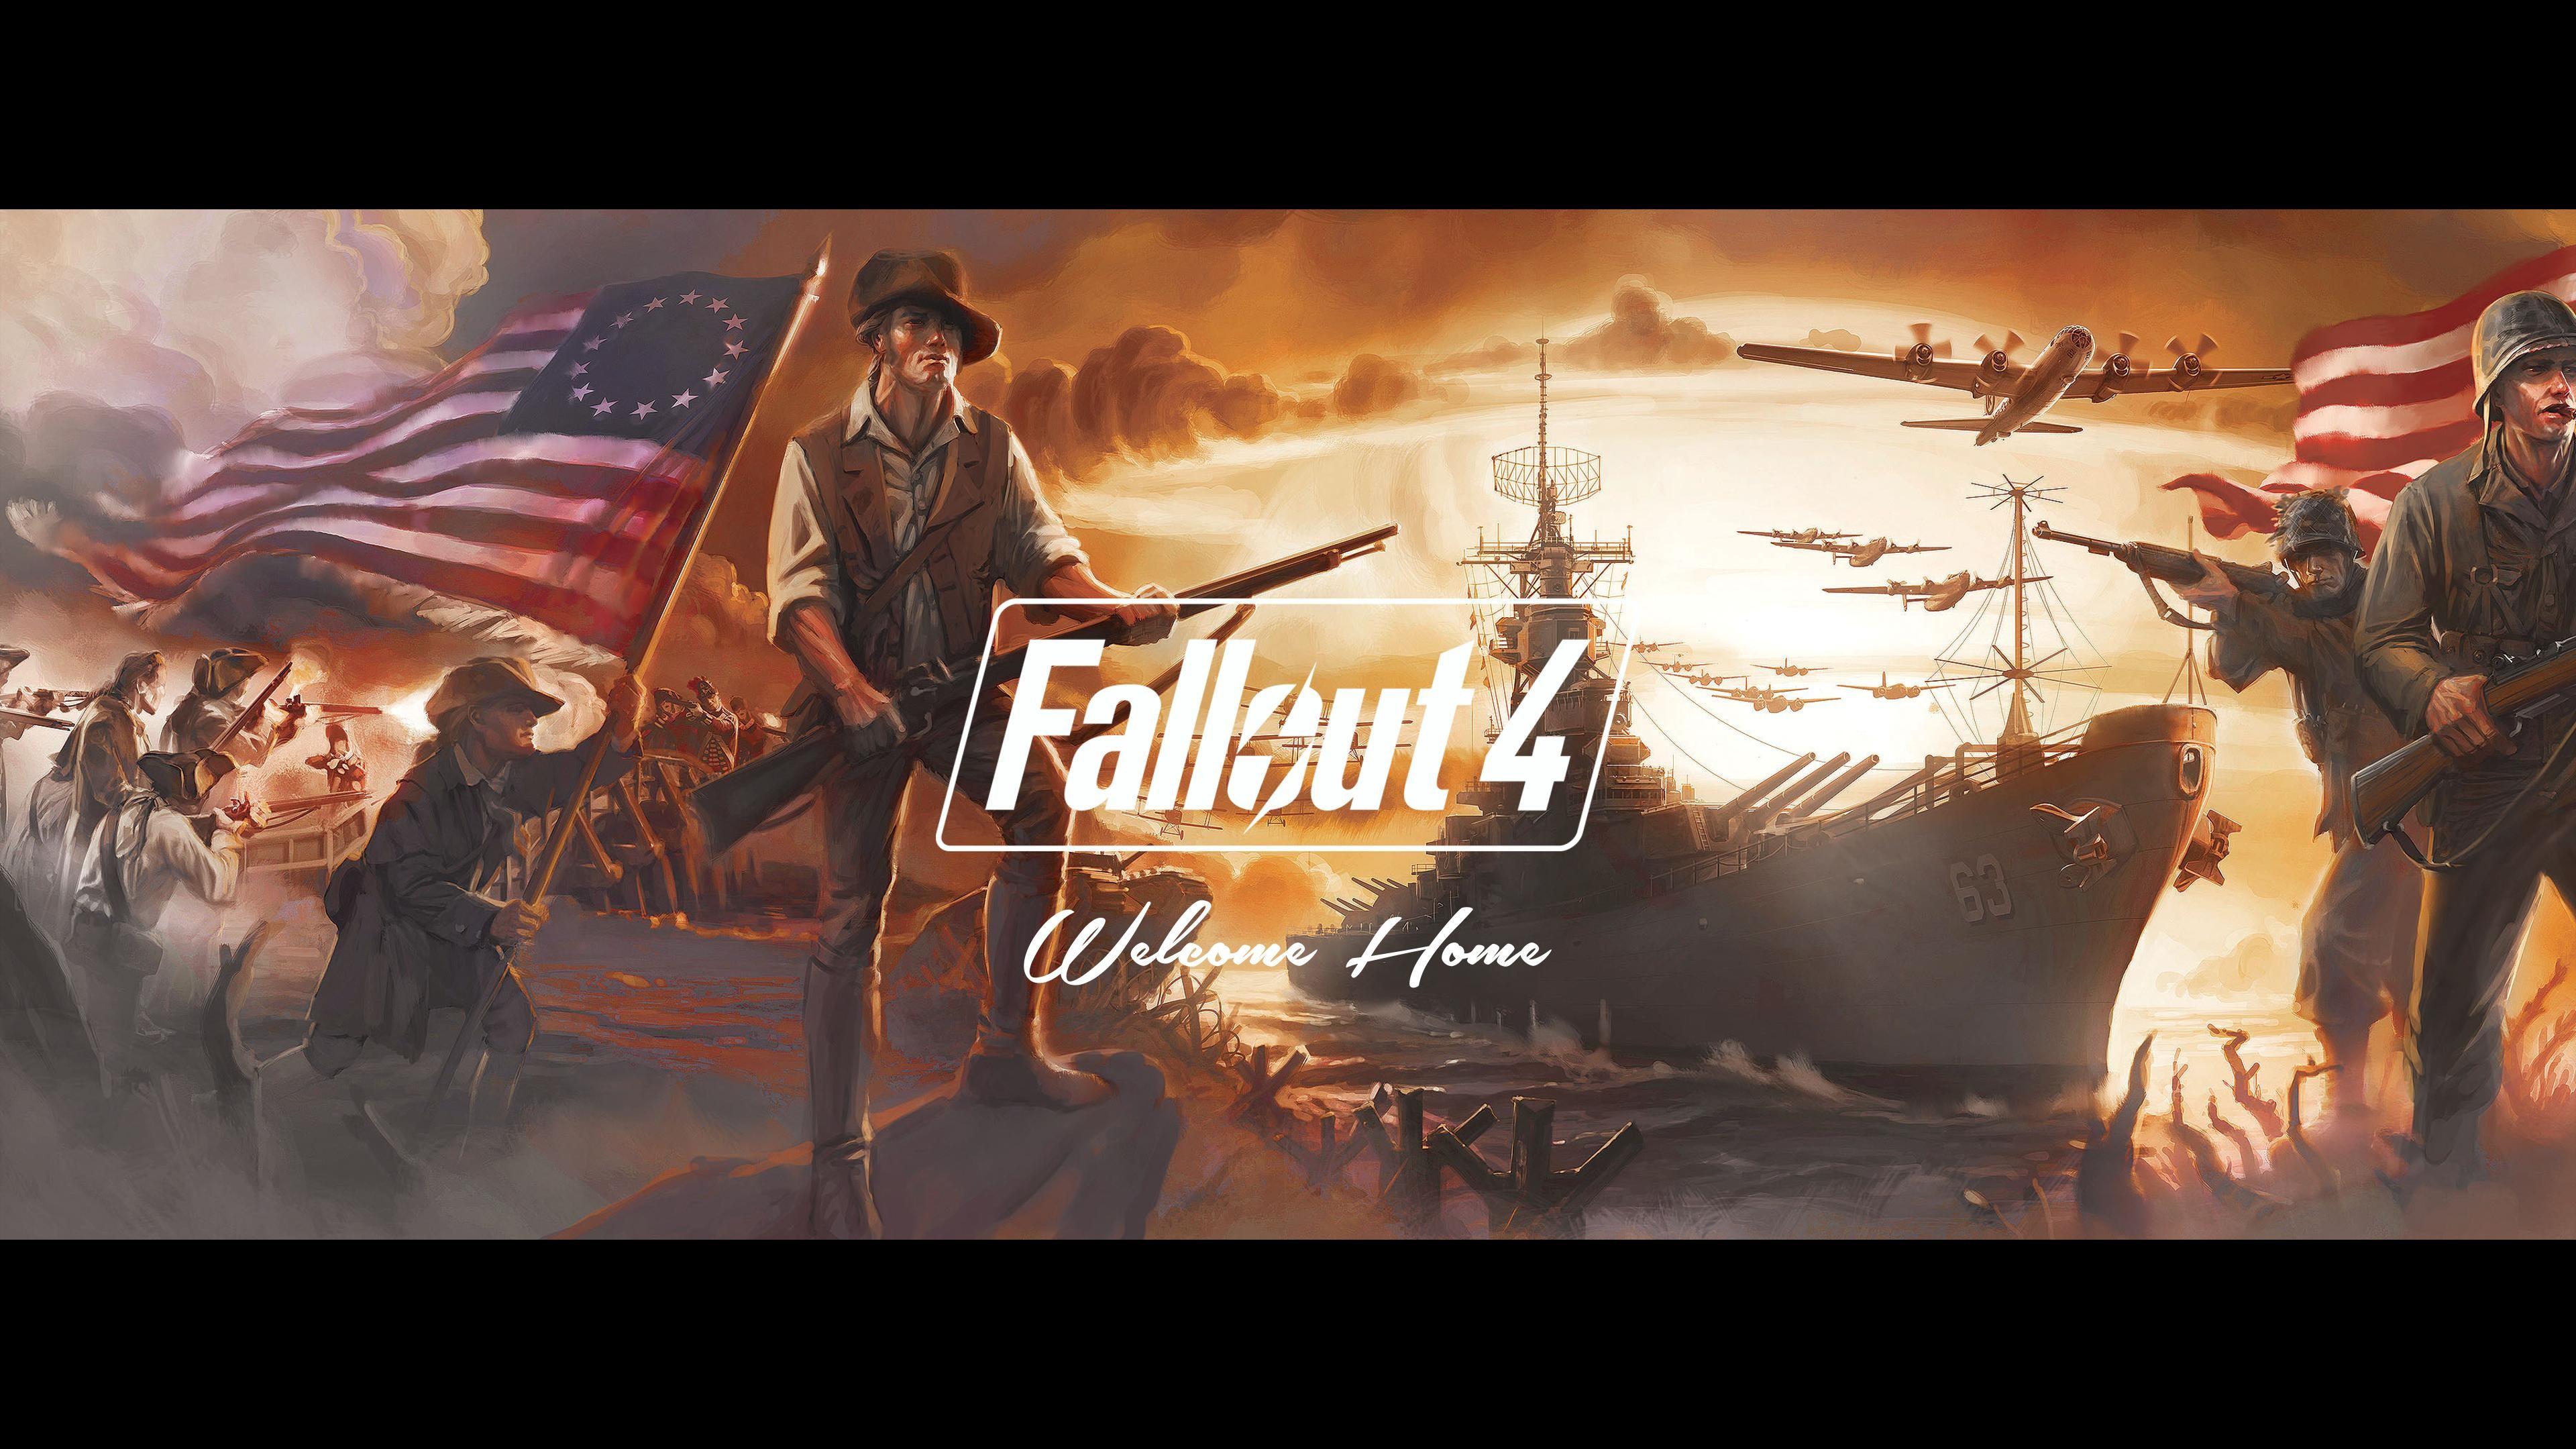 3840x2160 Fallout 4 2015